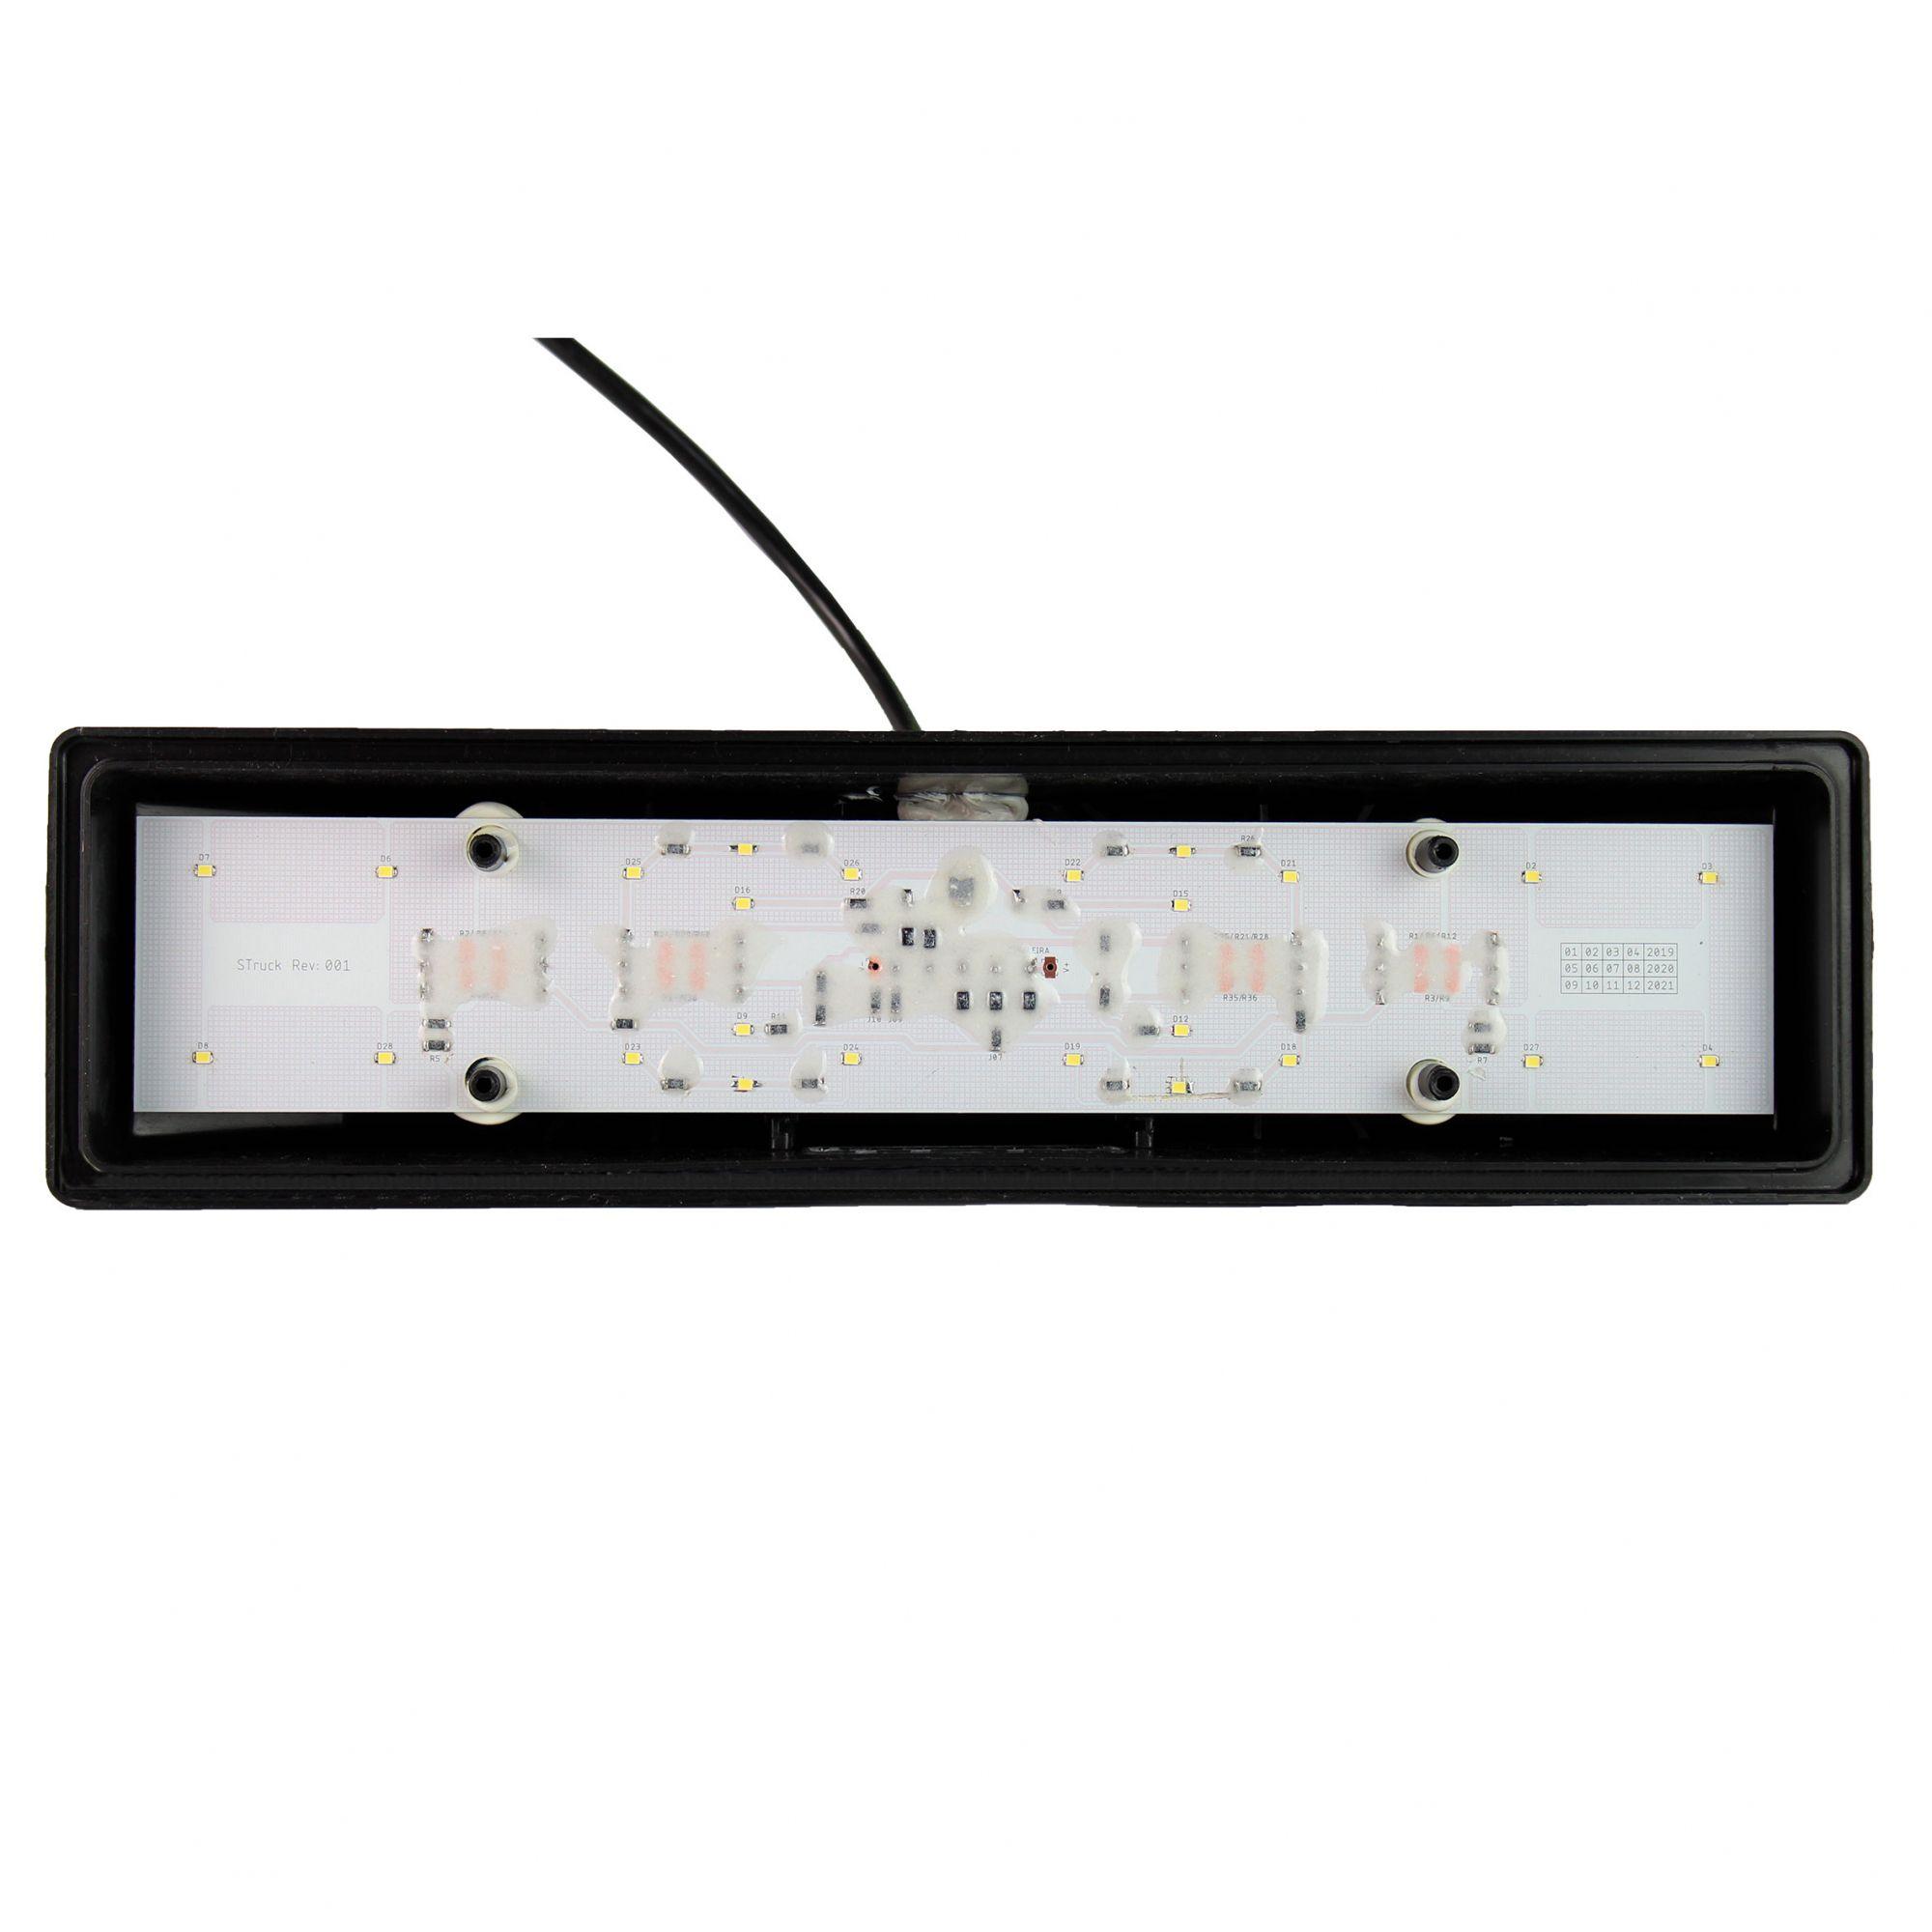 PAR LANTERNA TRASEIRA LED MB 88/ - SINBRAX/PRADO - 12V/24V